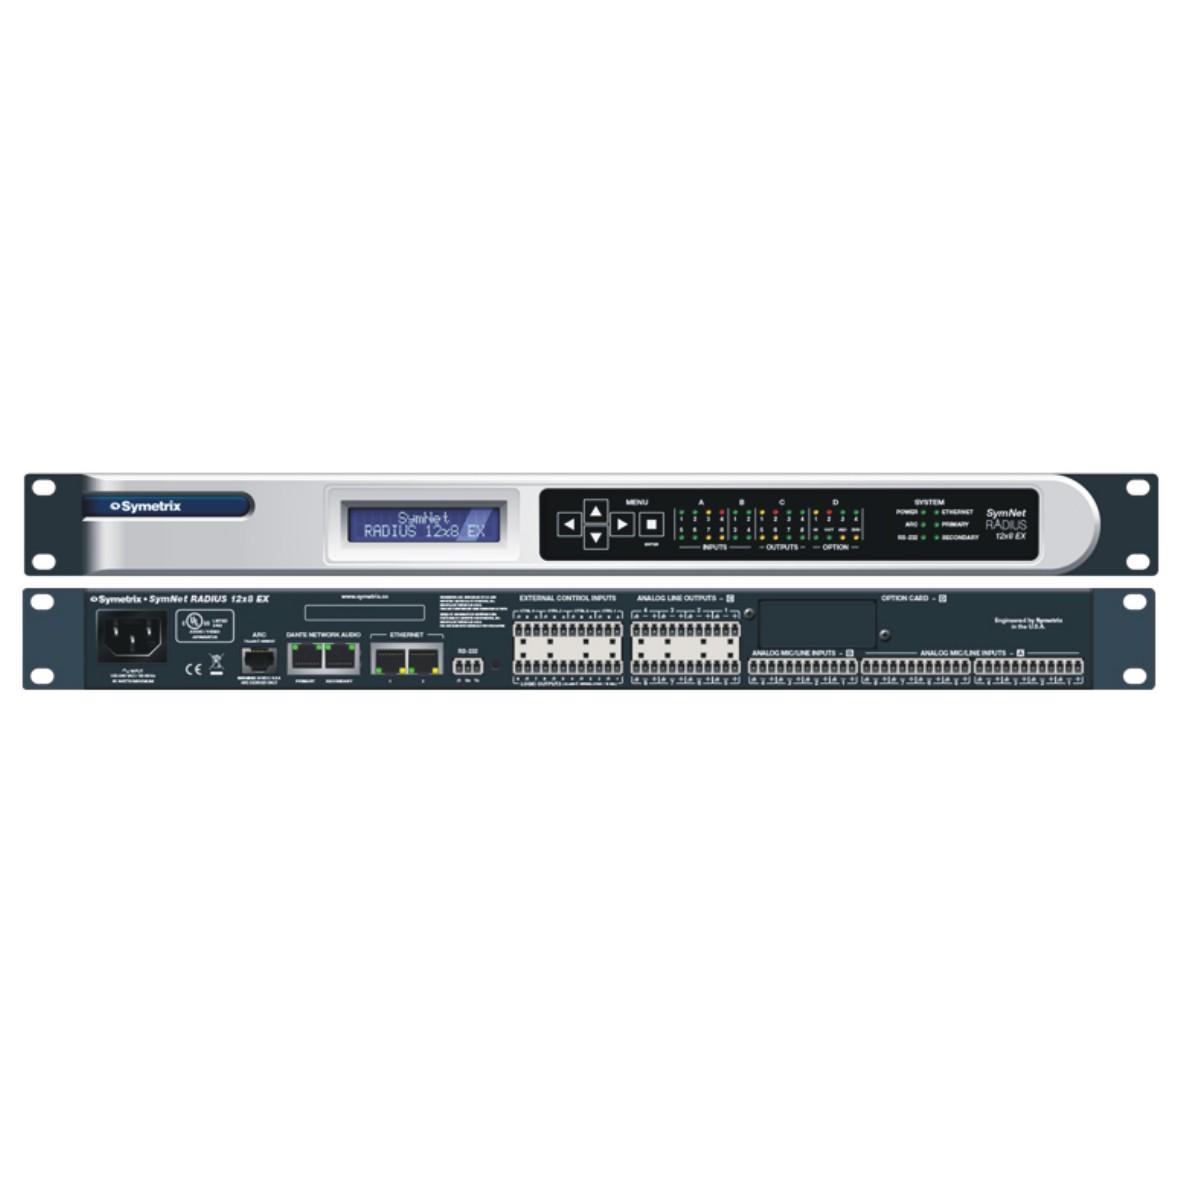 Radius 12x8 数字音频处理器